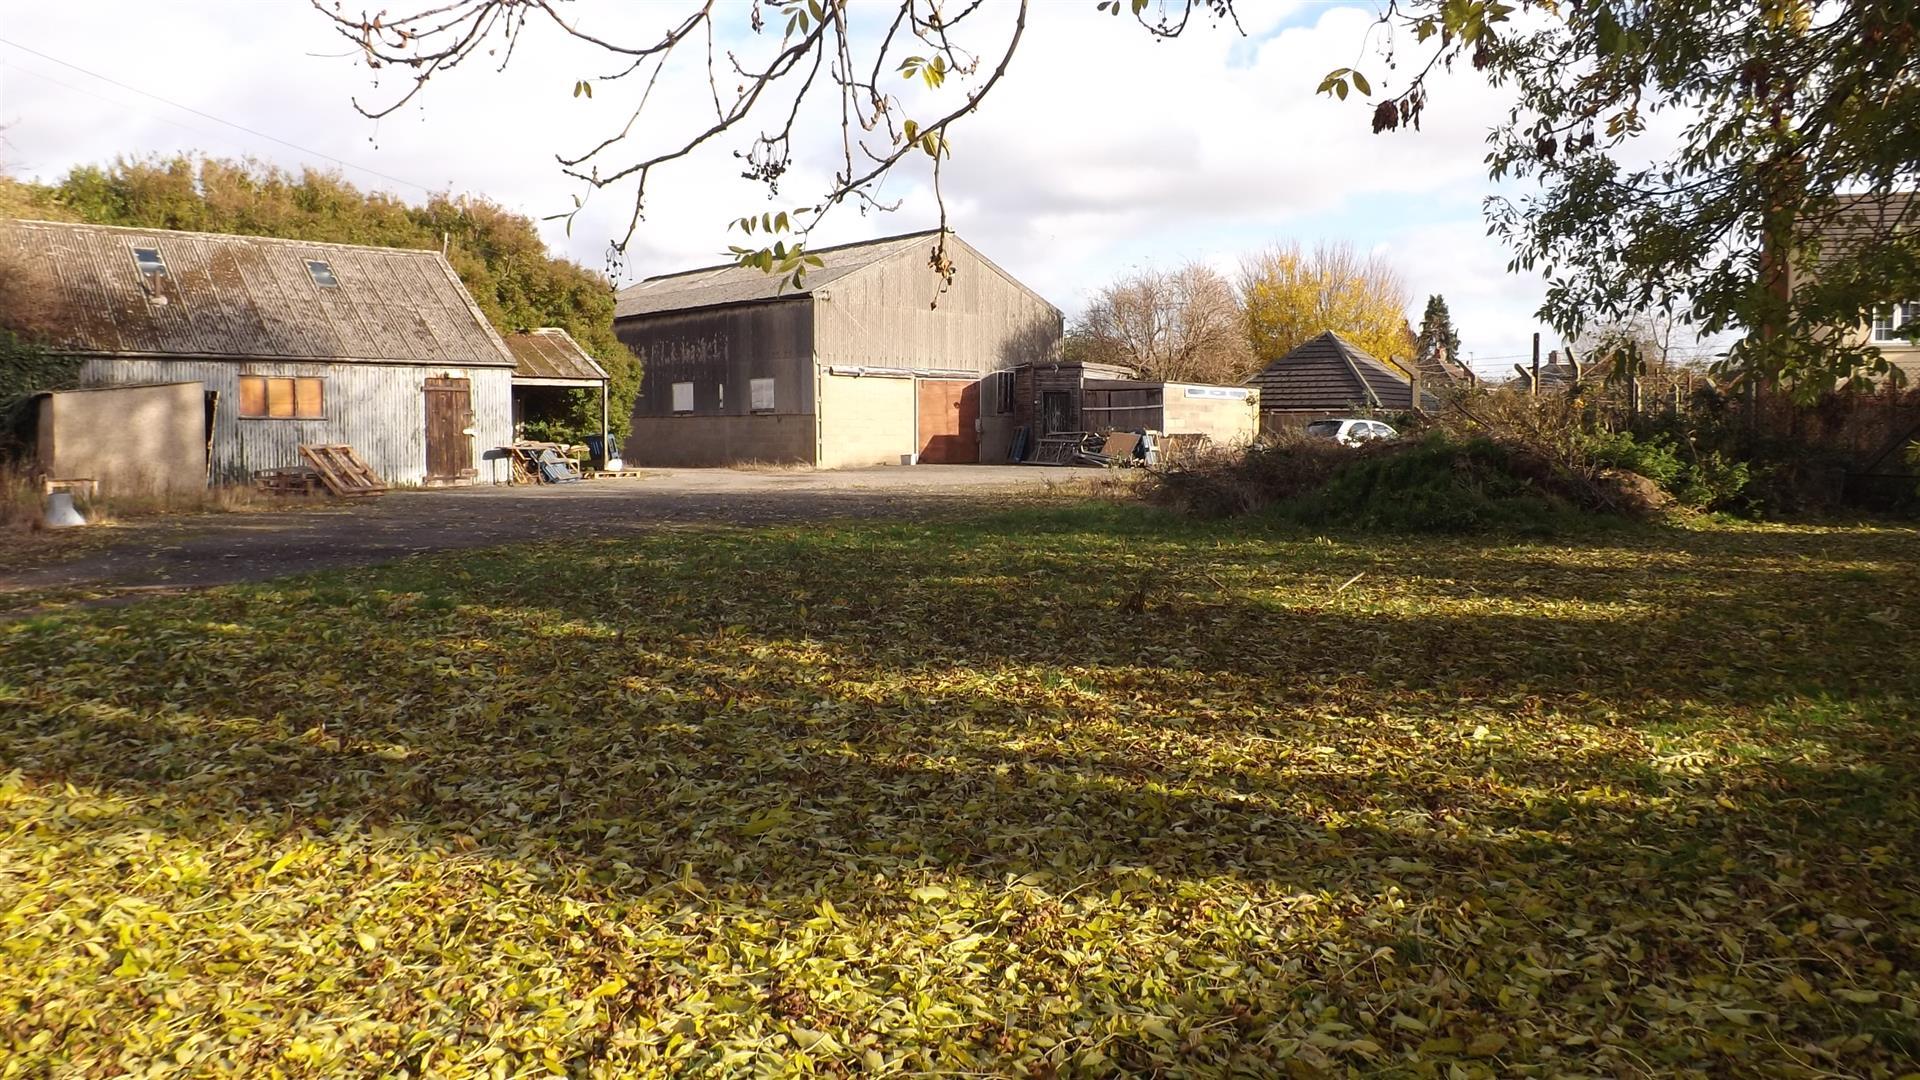 Plot for sale in Sutton Bridge Spalding, PE12 9SD - Property Image 1